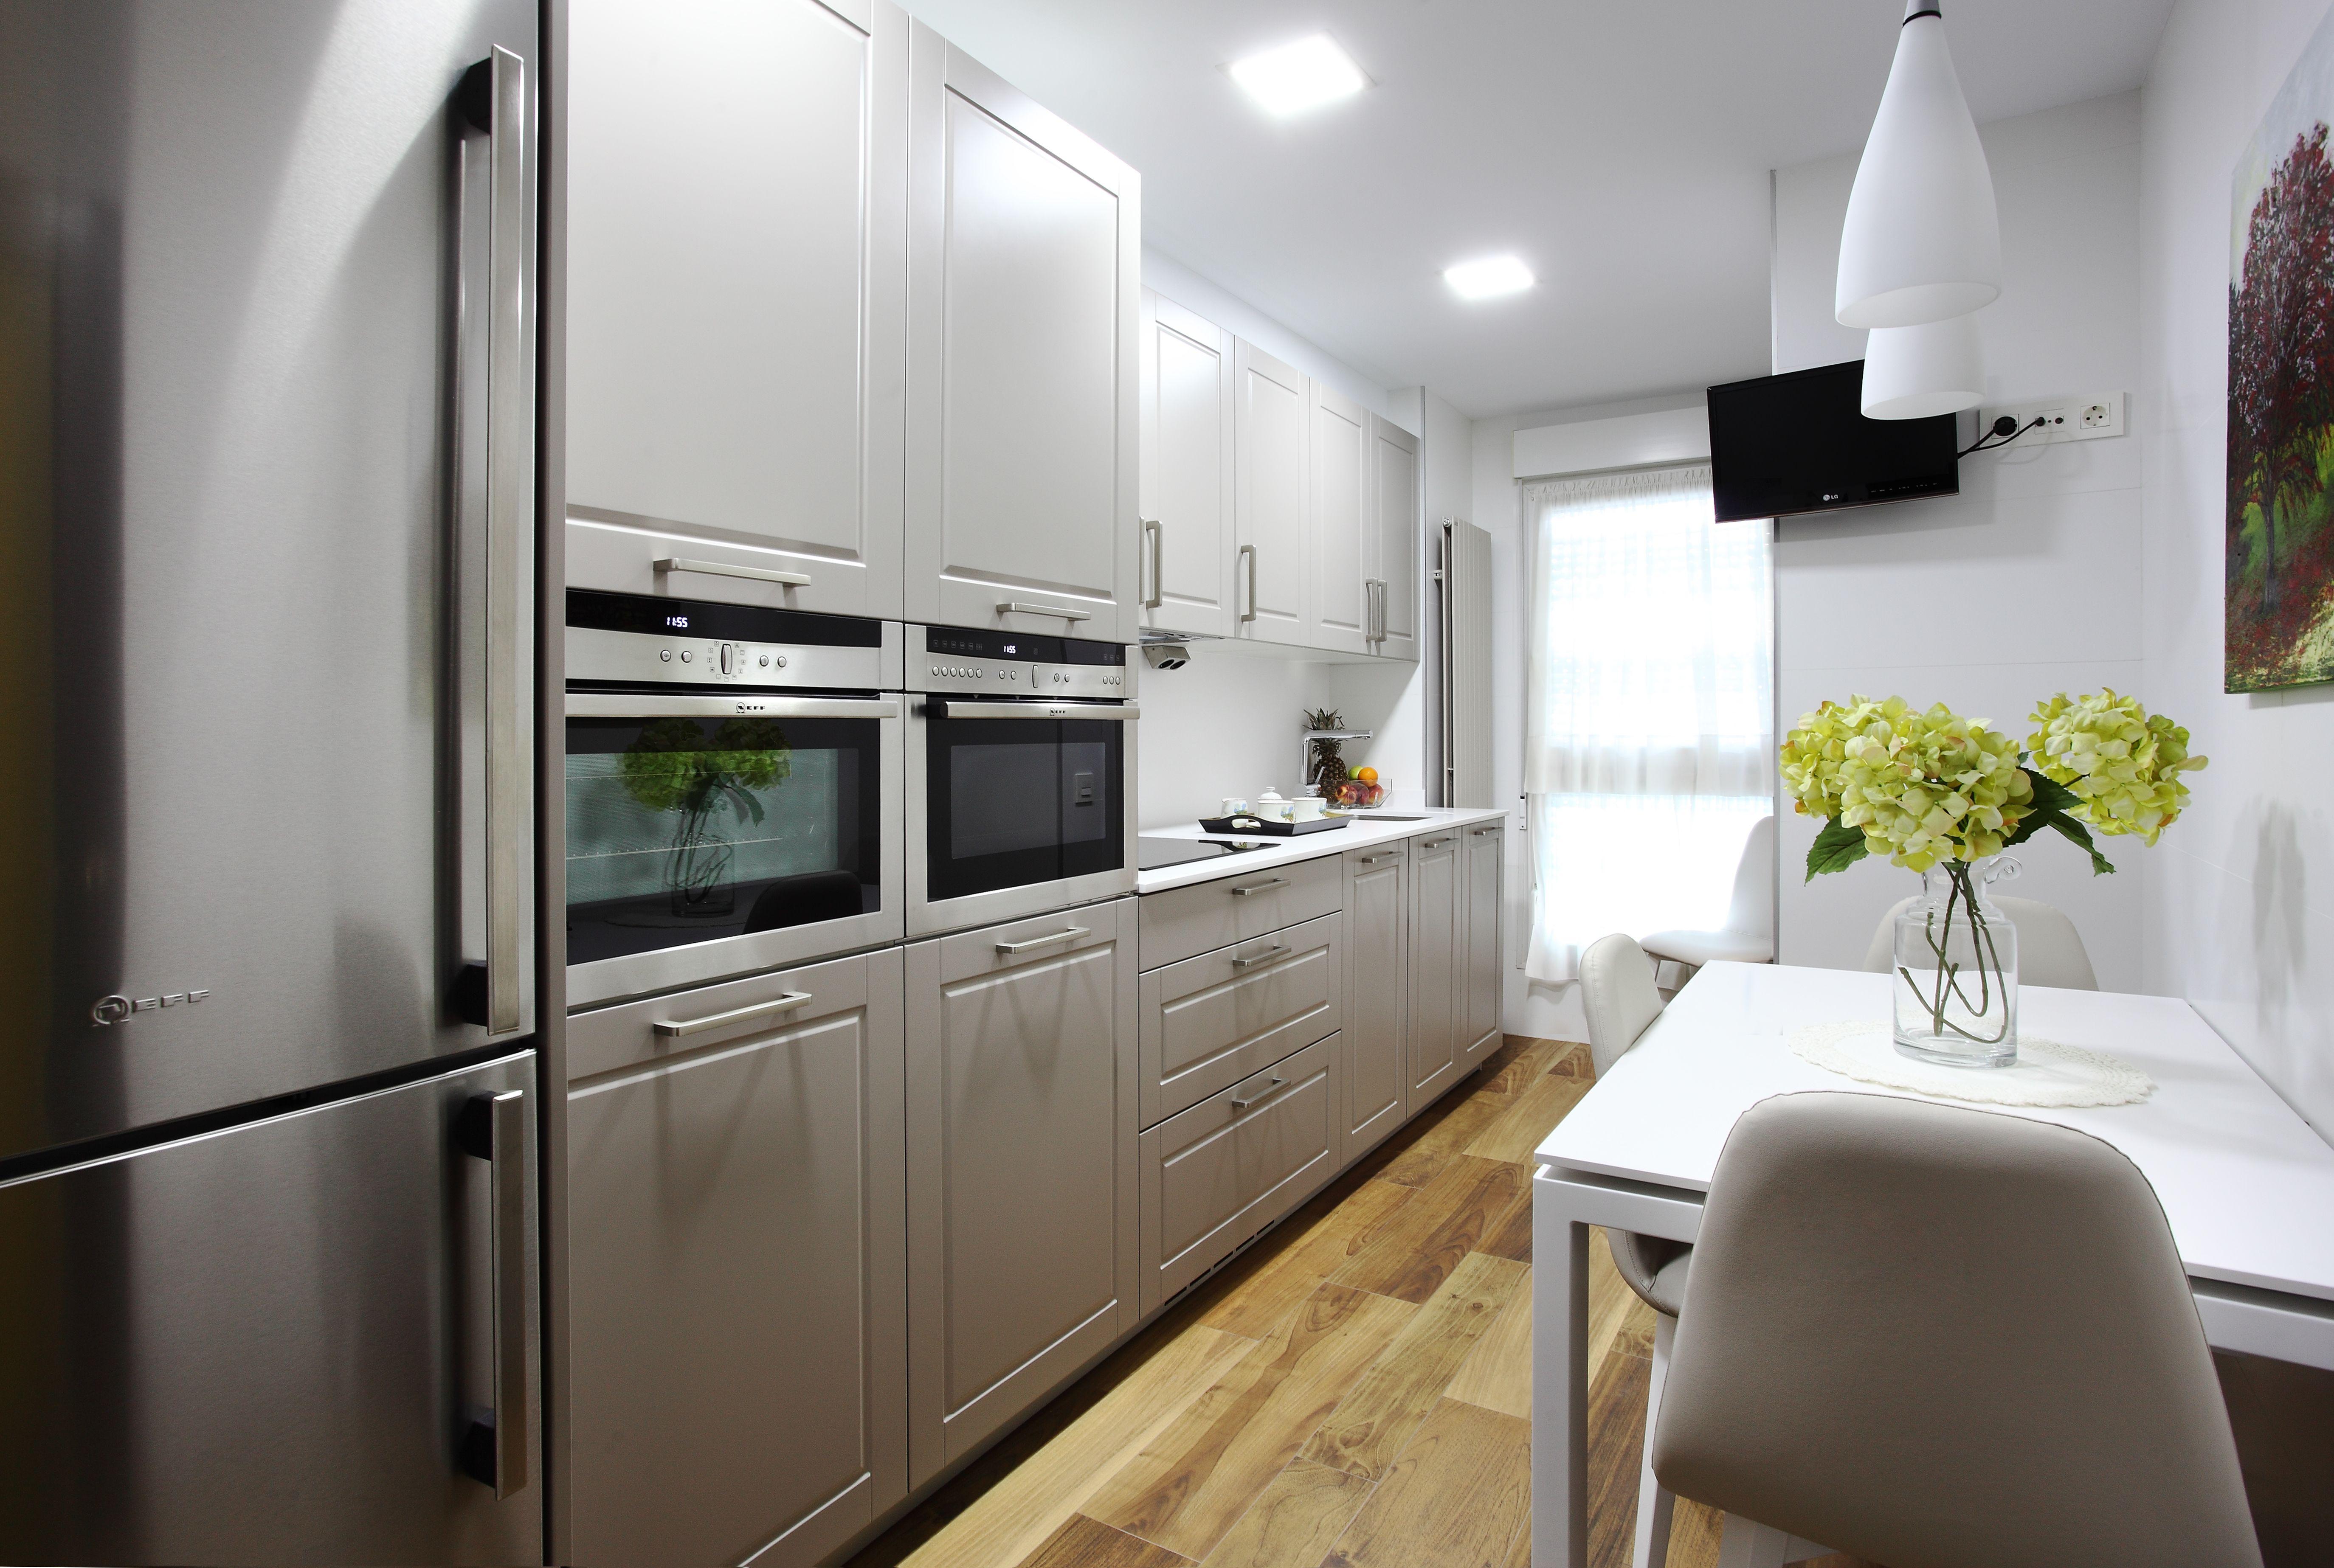 Proyecto completo de reforma cocina oviedo dise o cocina for Decoracion oviedo